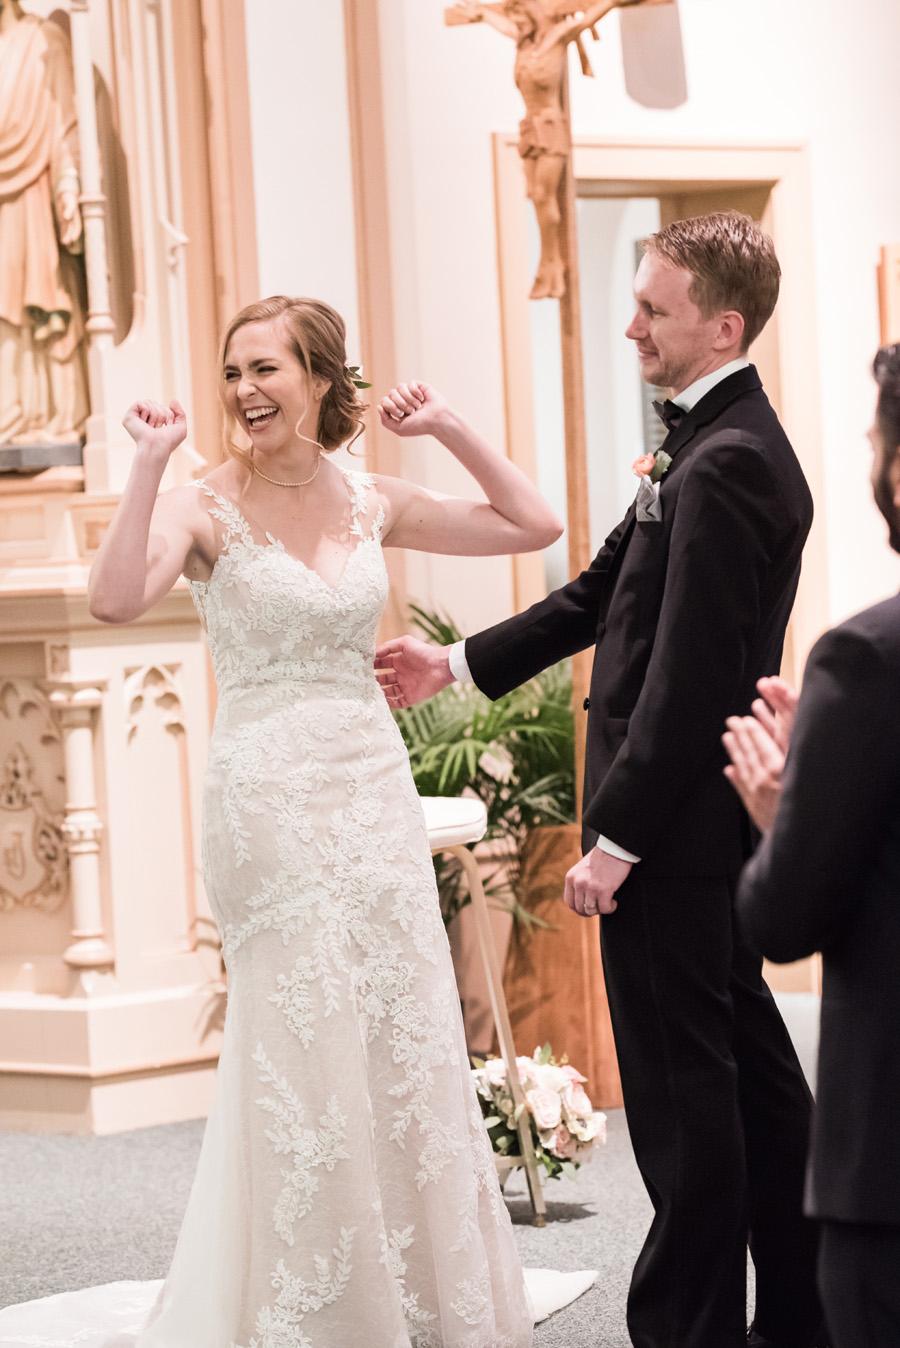 Bride reacting during wedding ceremony.